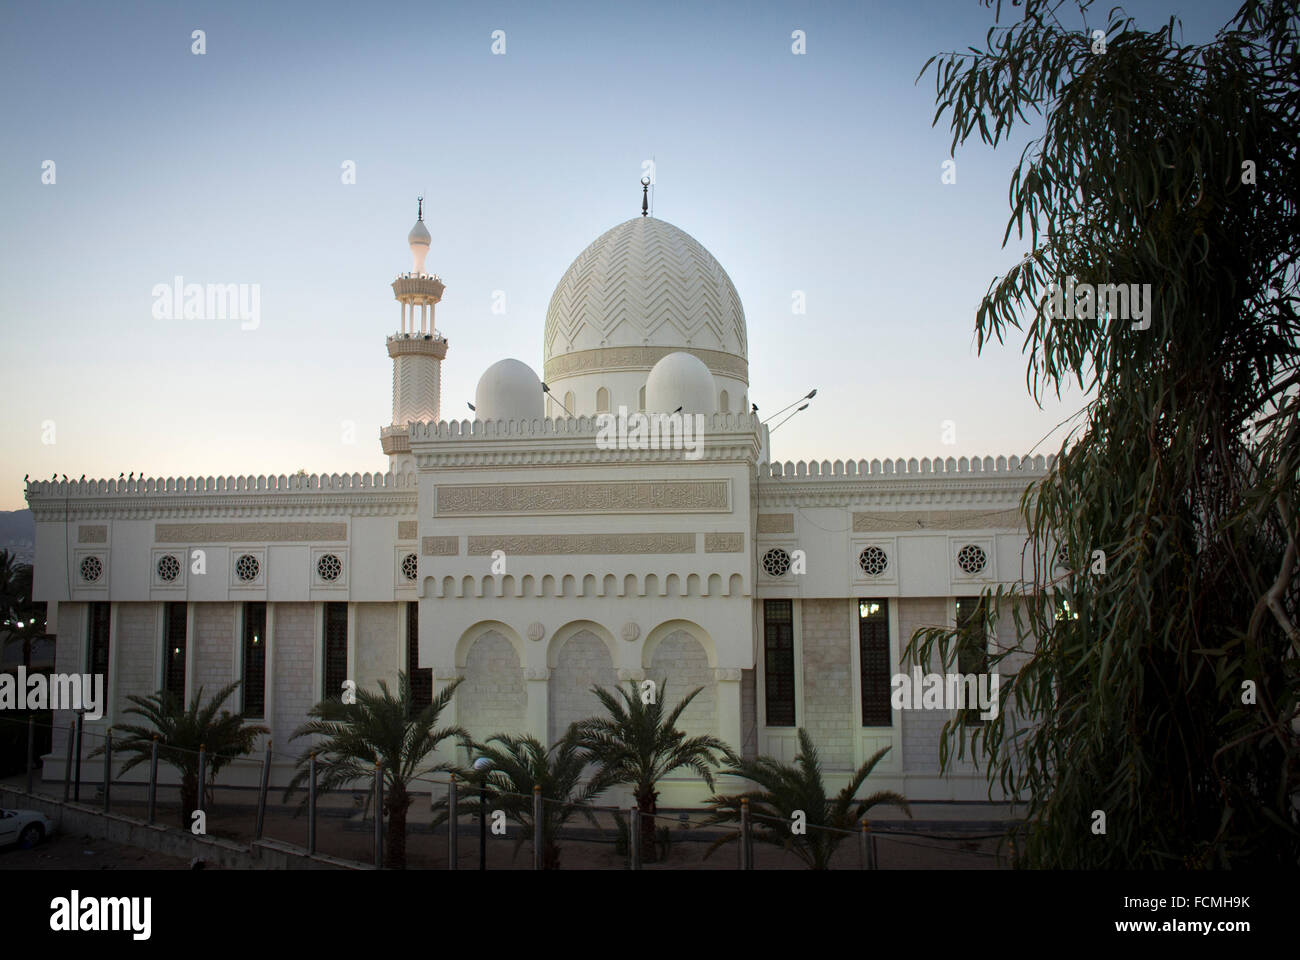 Al Sharif-Hussein bin Ali Mosque, Aqaba, - Stock Image